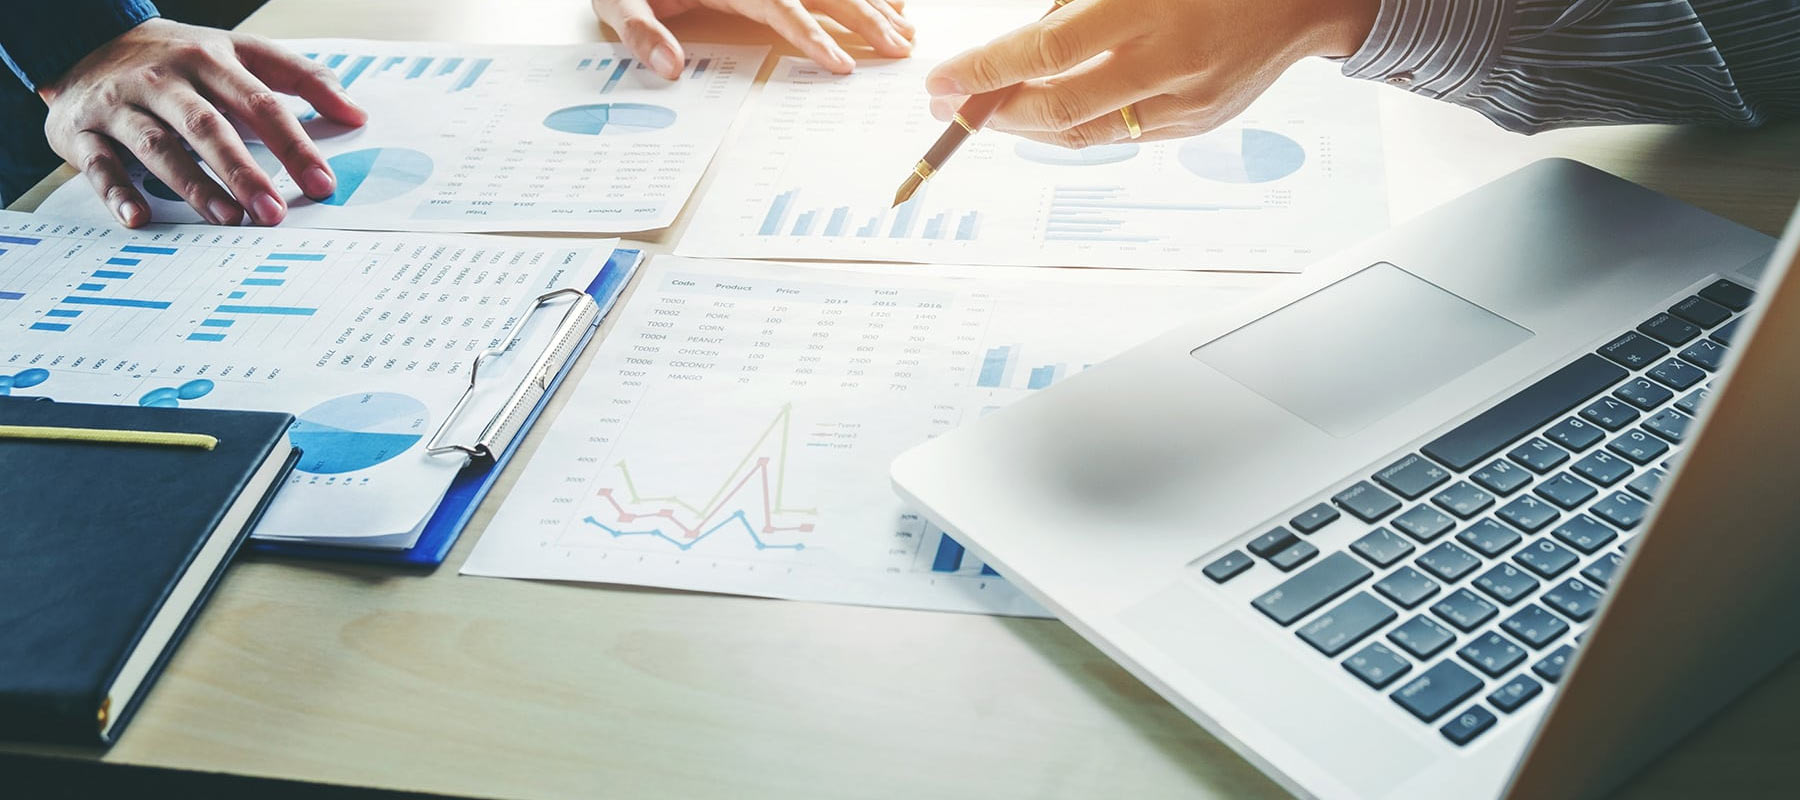 Export market Research